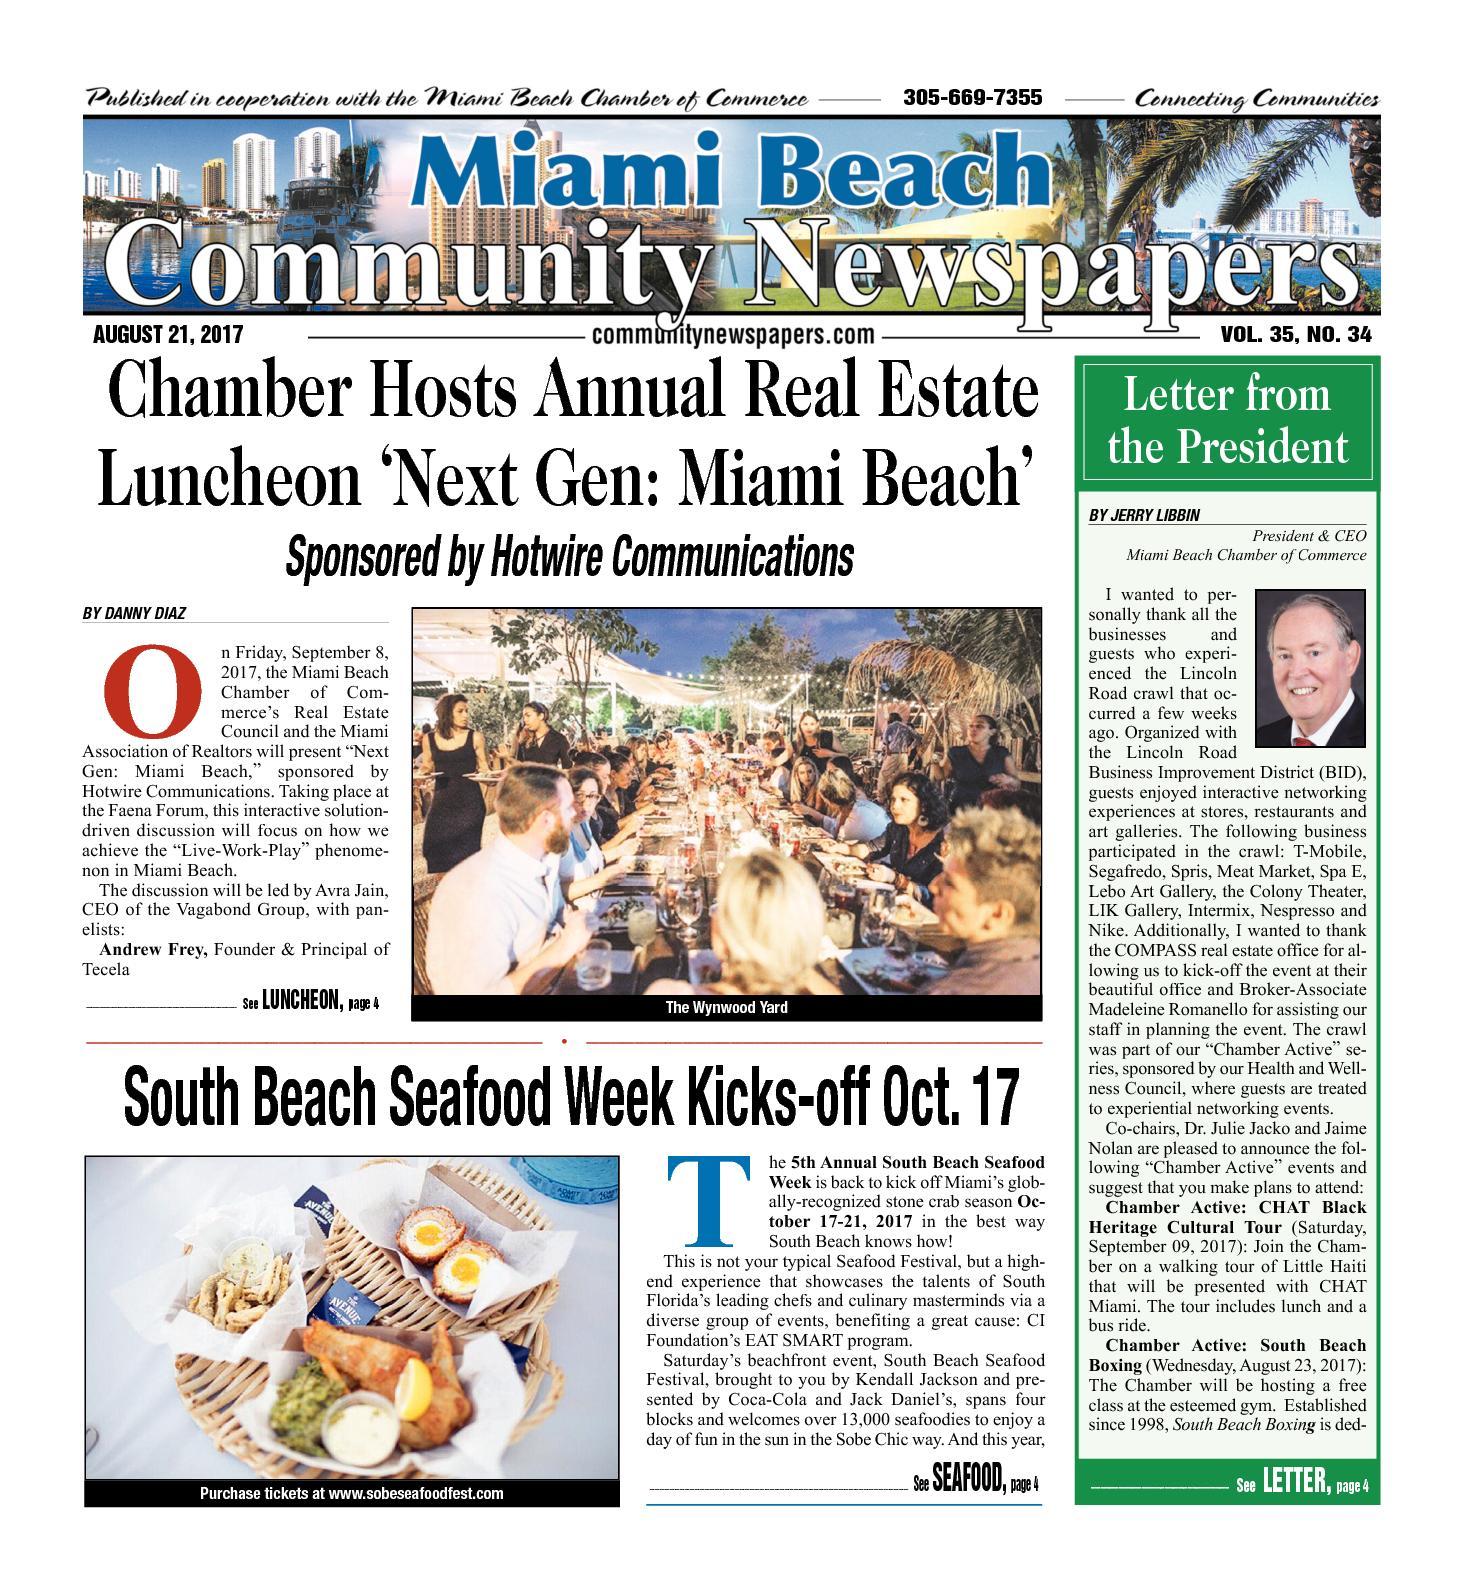 Calaméo Miami Beach News 08 21 2017